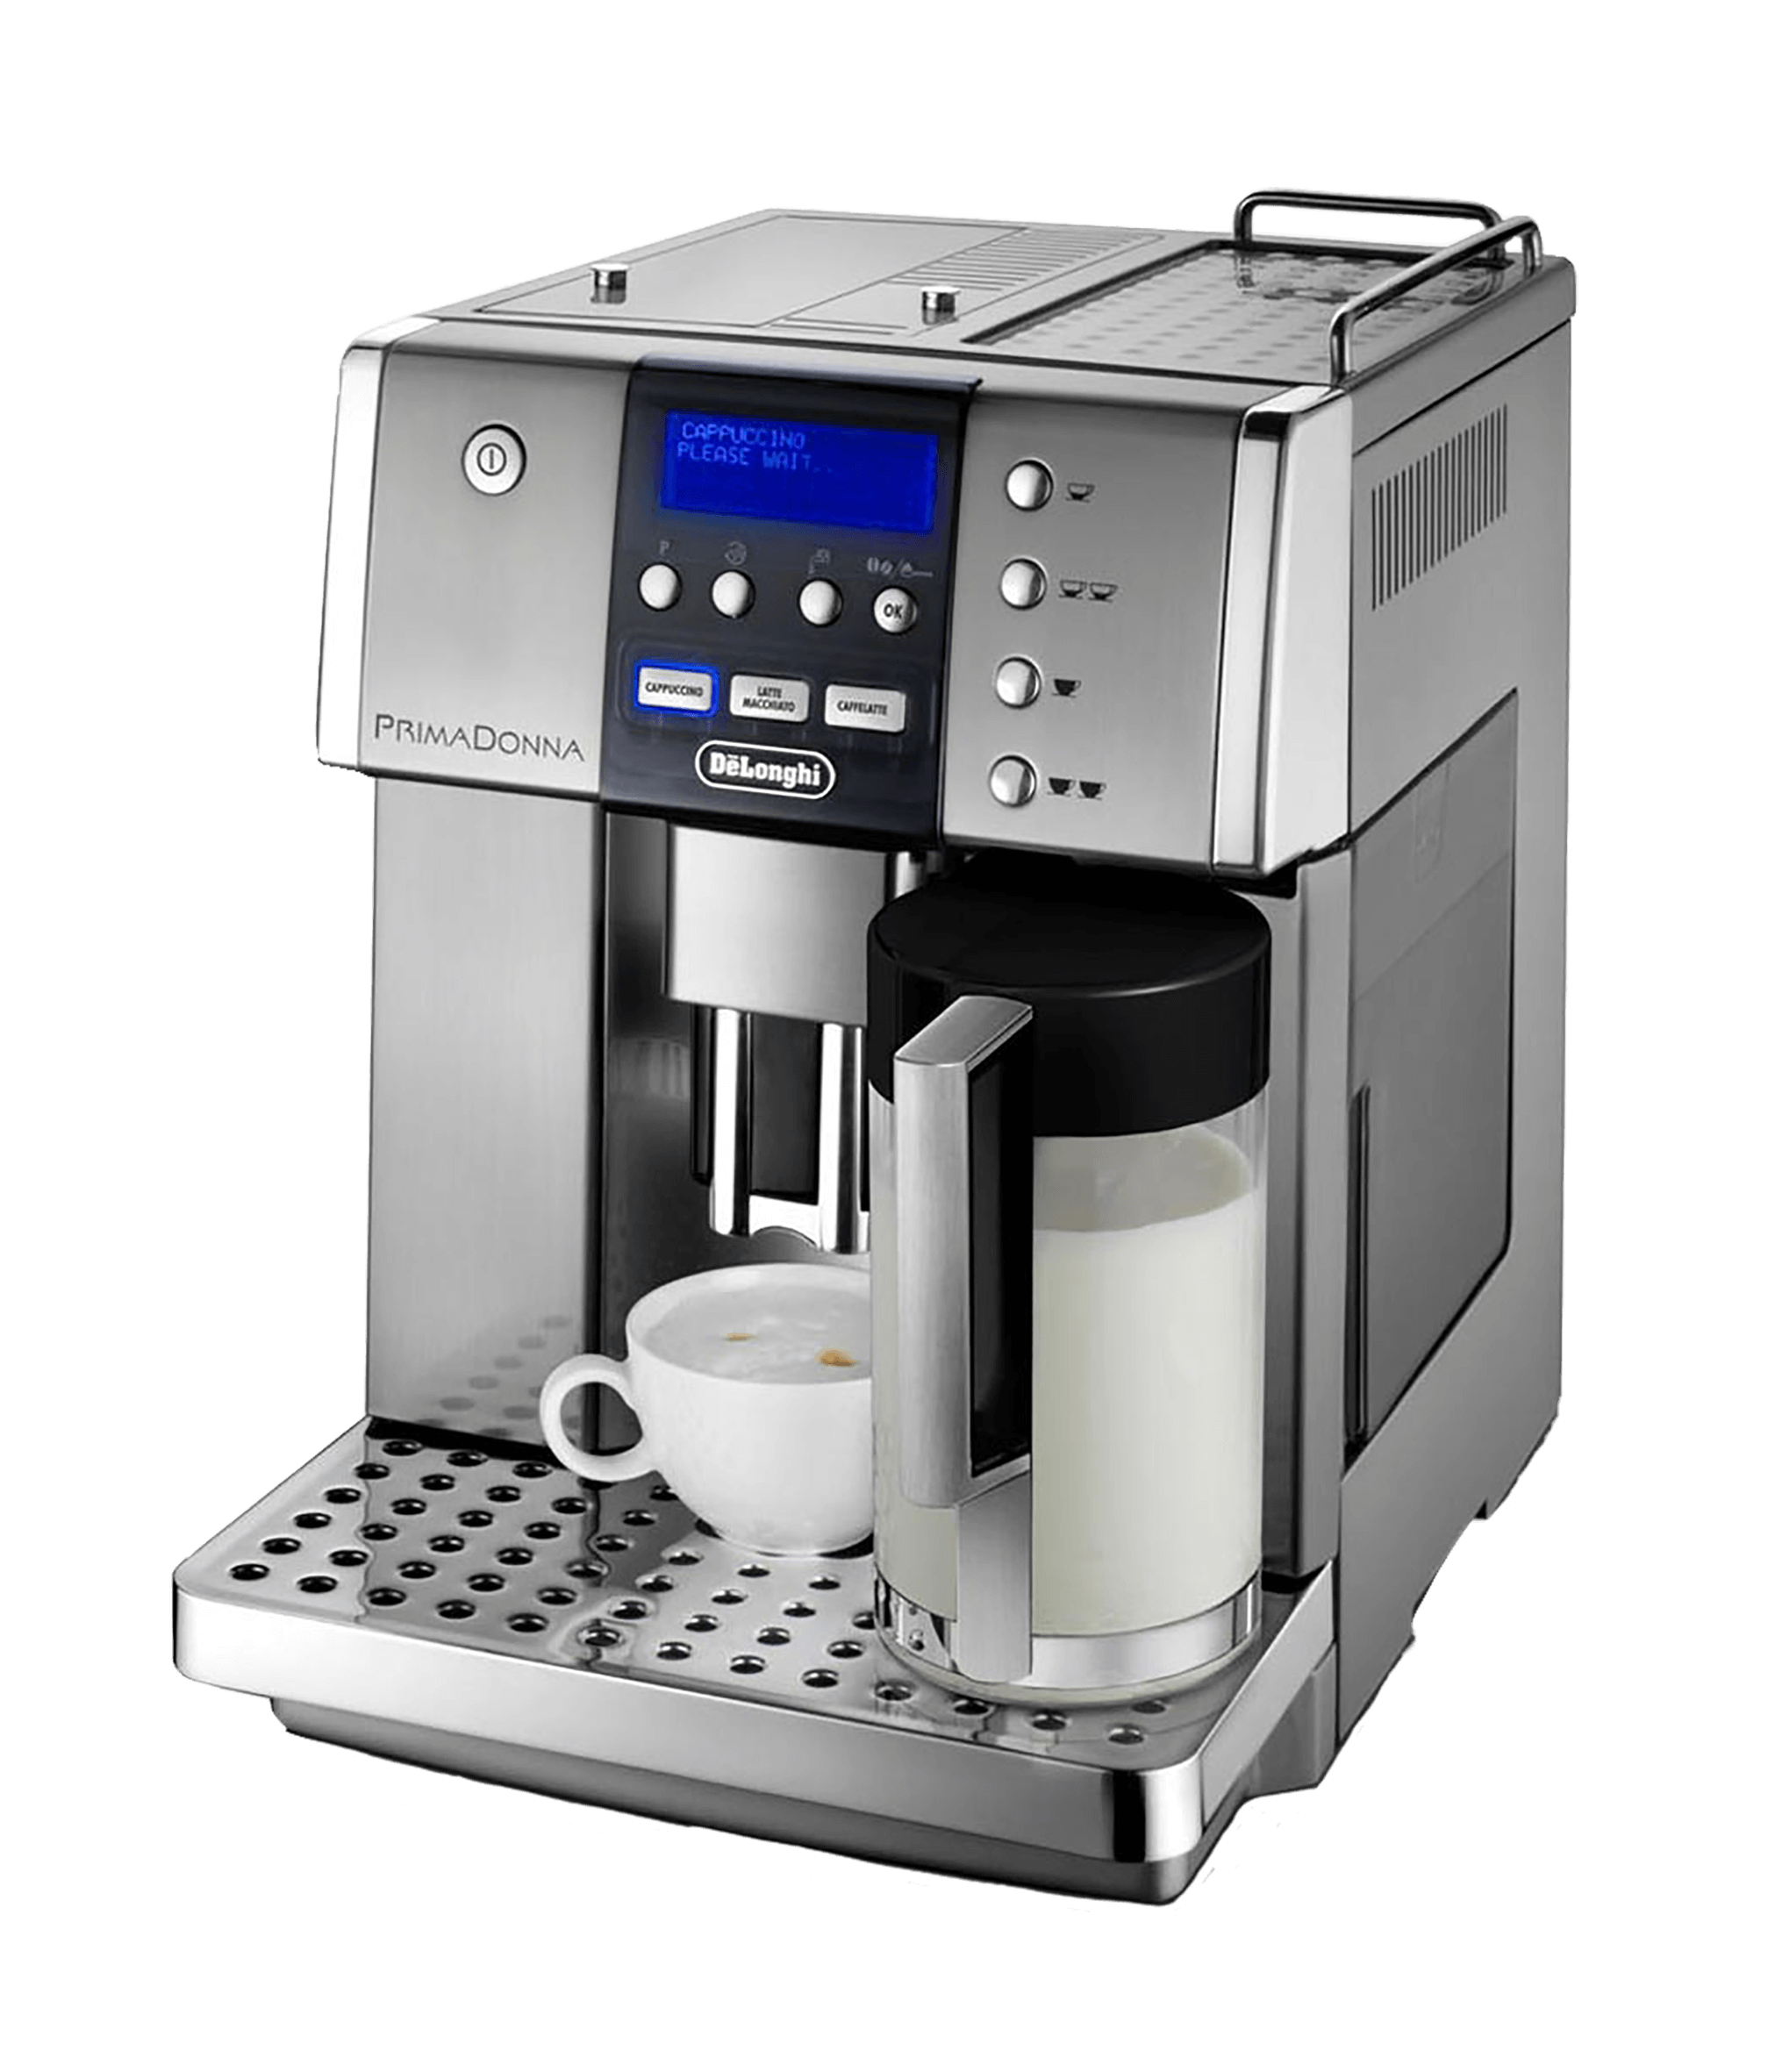 Delonghi Prima Donna Coffee Machine transparent PNG.